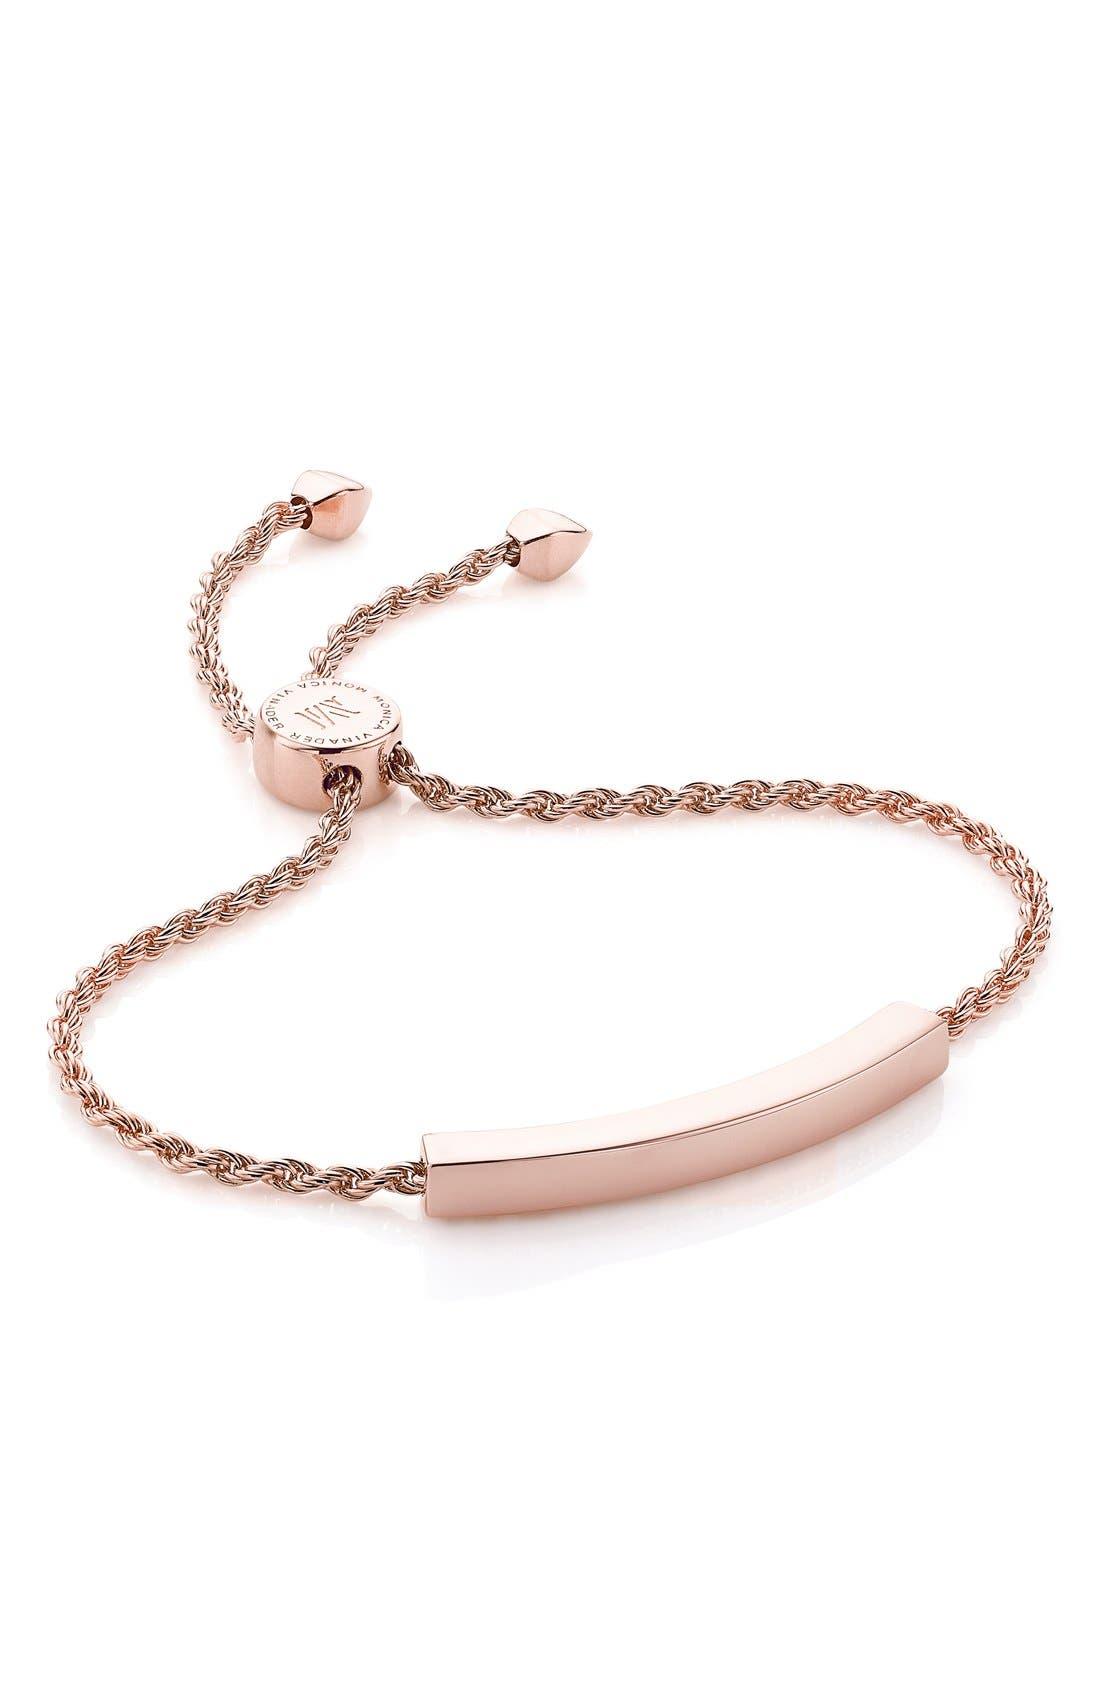 Main Image - Monica Vinader Linear Friendship Chain Bracelet